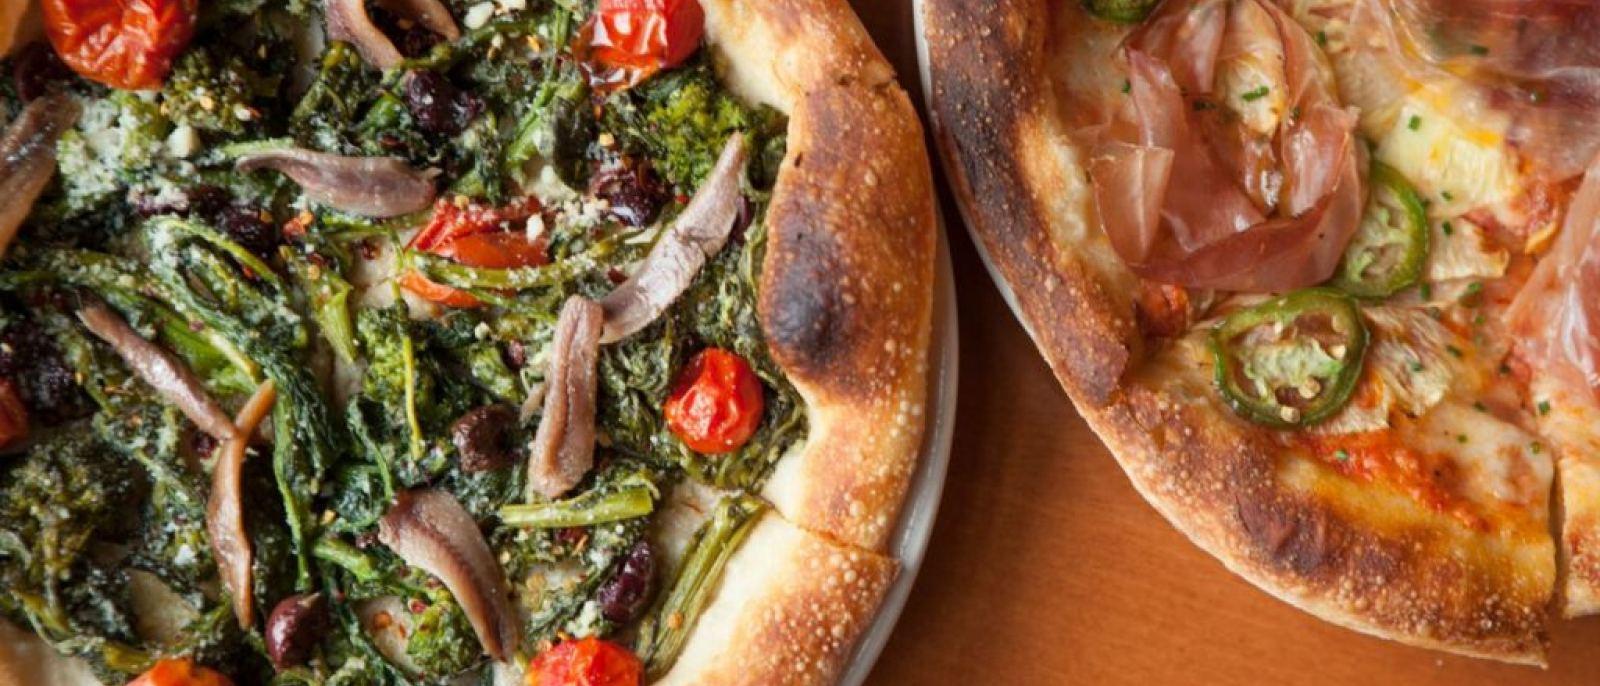 Fennel sausage, panna, mozzarella, red onions, scallions | Photo courtesy of Pizzeria Mozza, Facebook